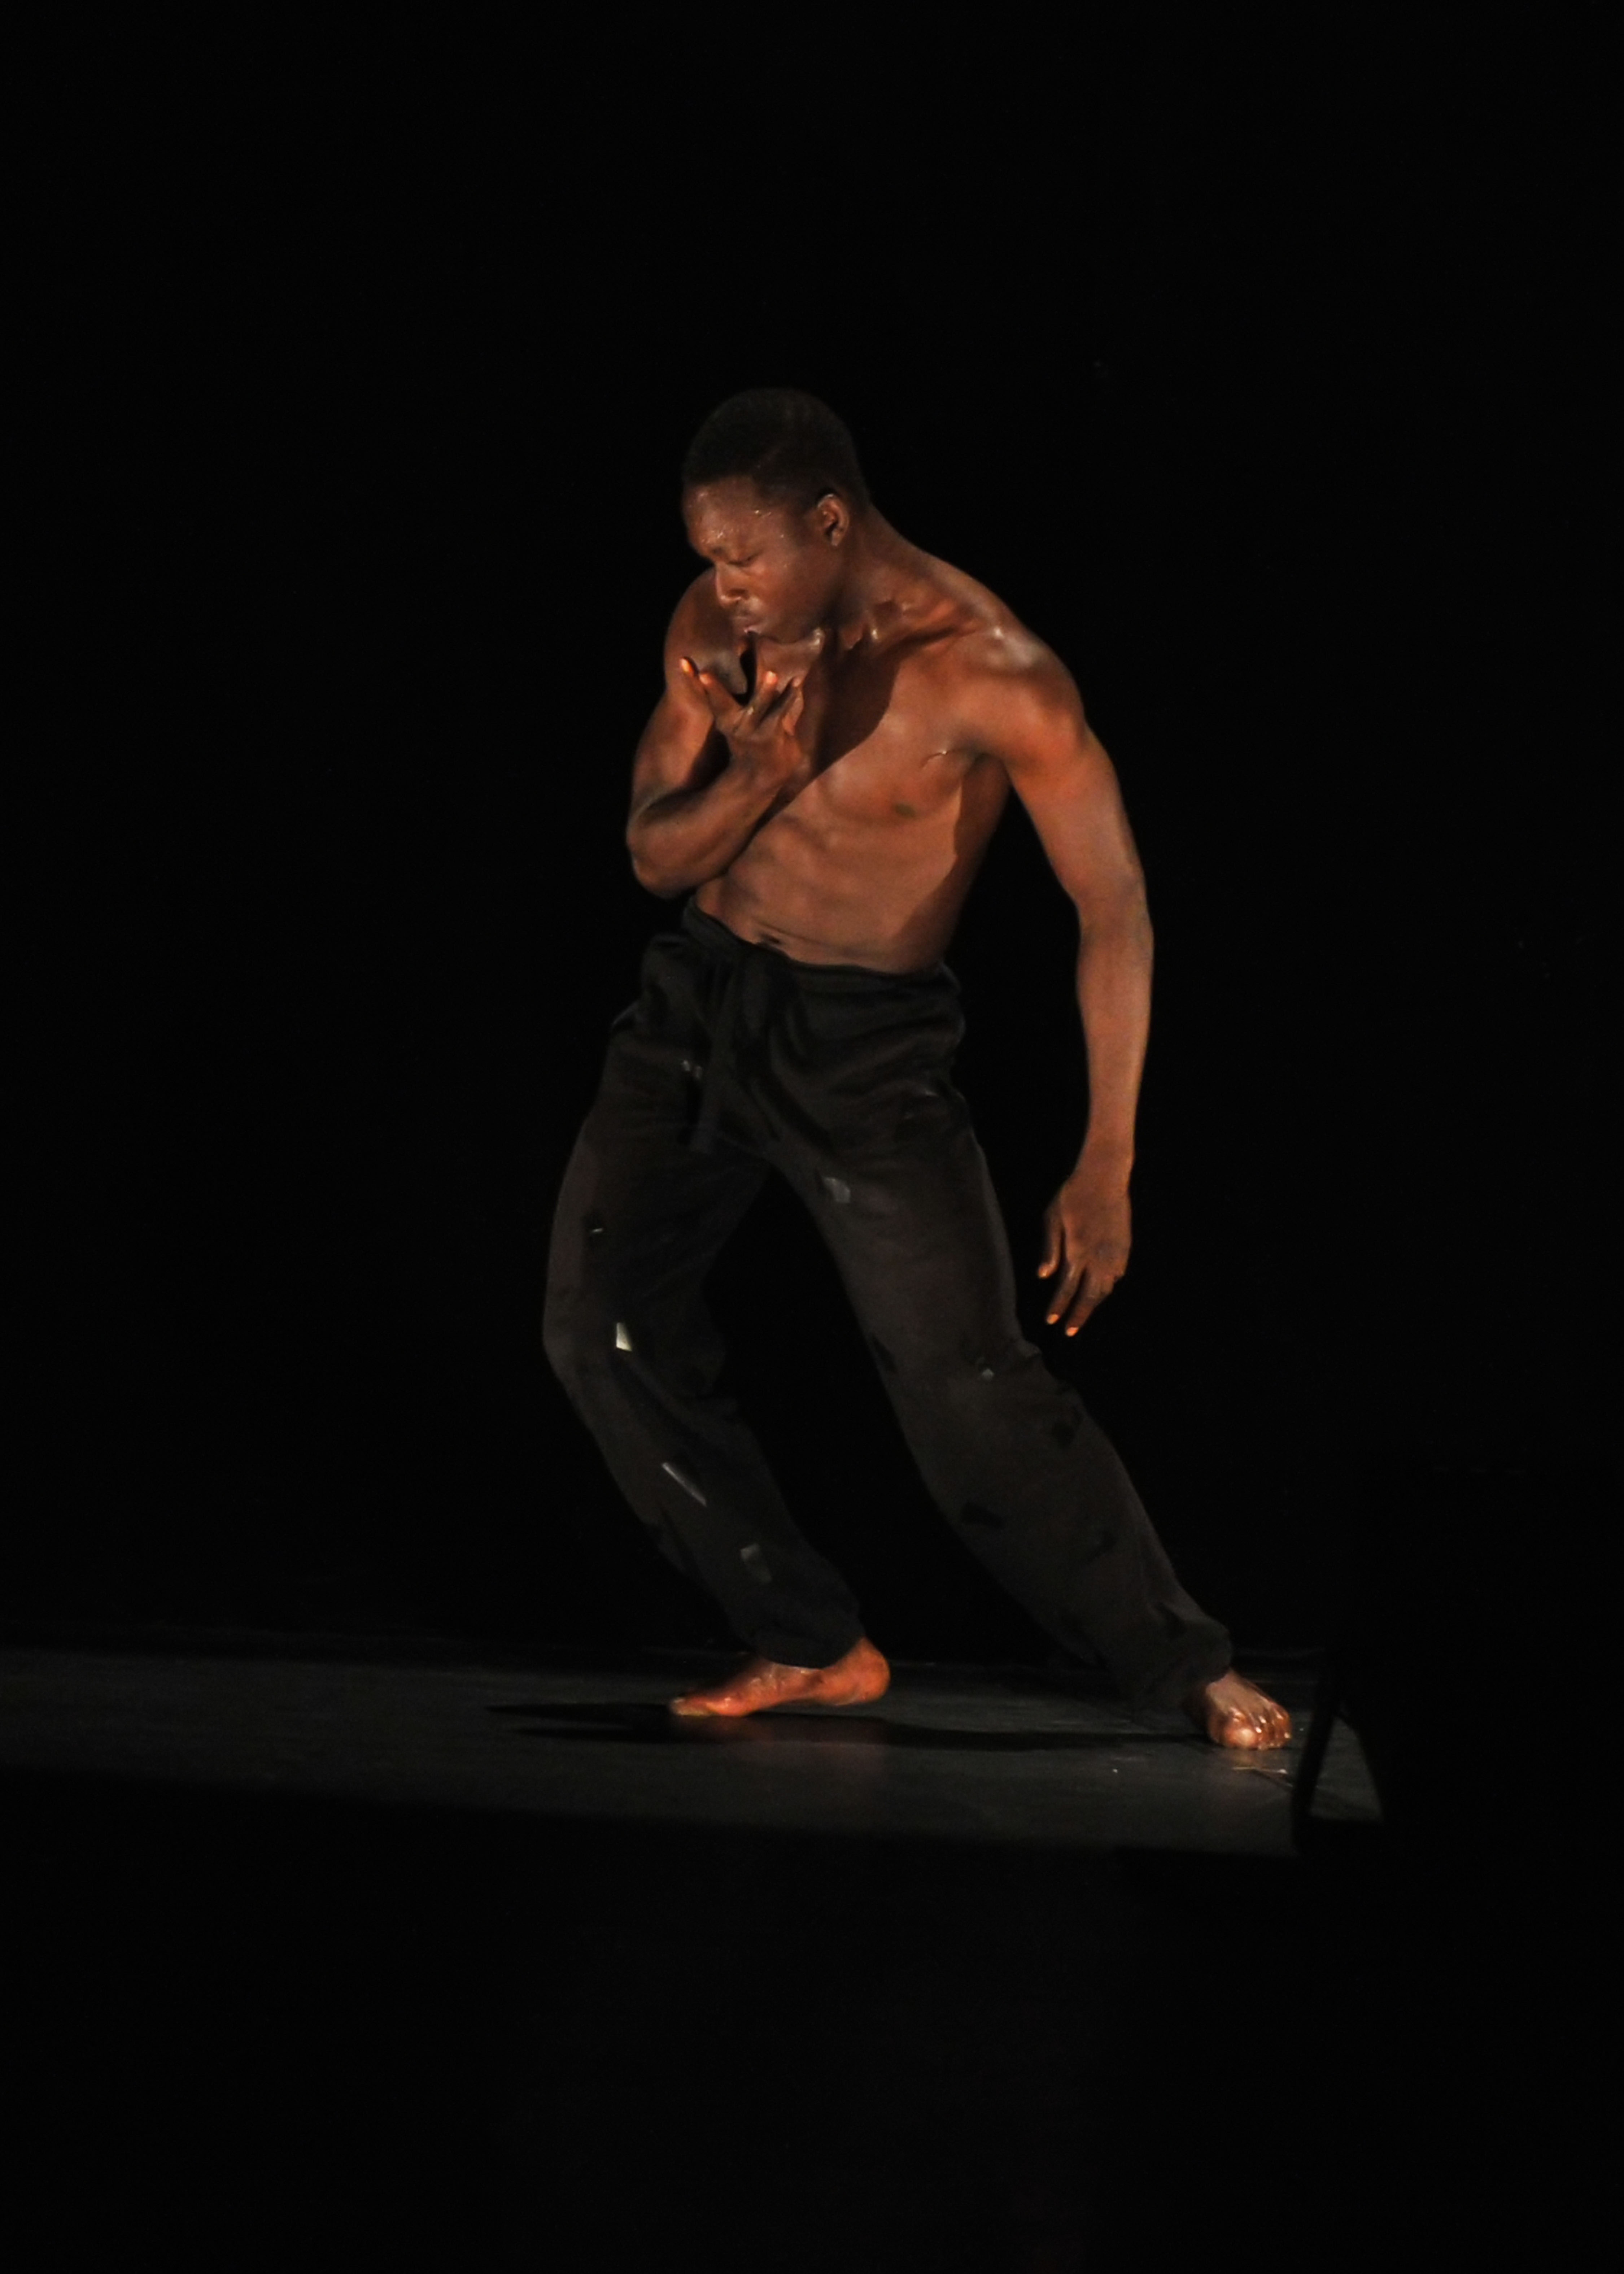 http://www.danzaurbana.eu/associazione/wp-content/uploads/2018/05/Masdanza_Ladji-Koné_2017.jpg